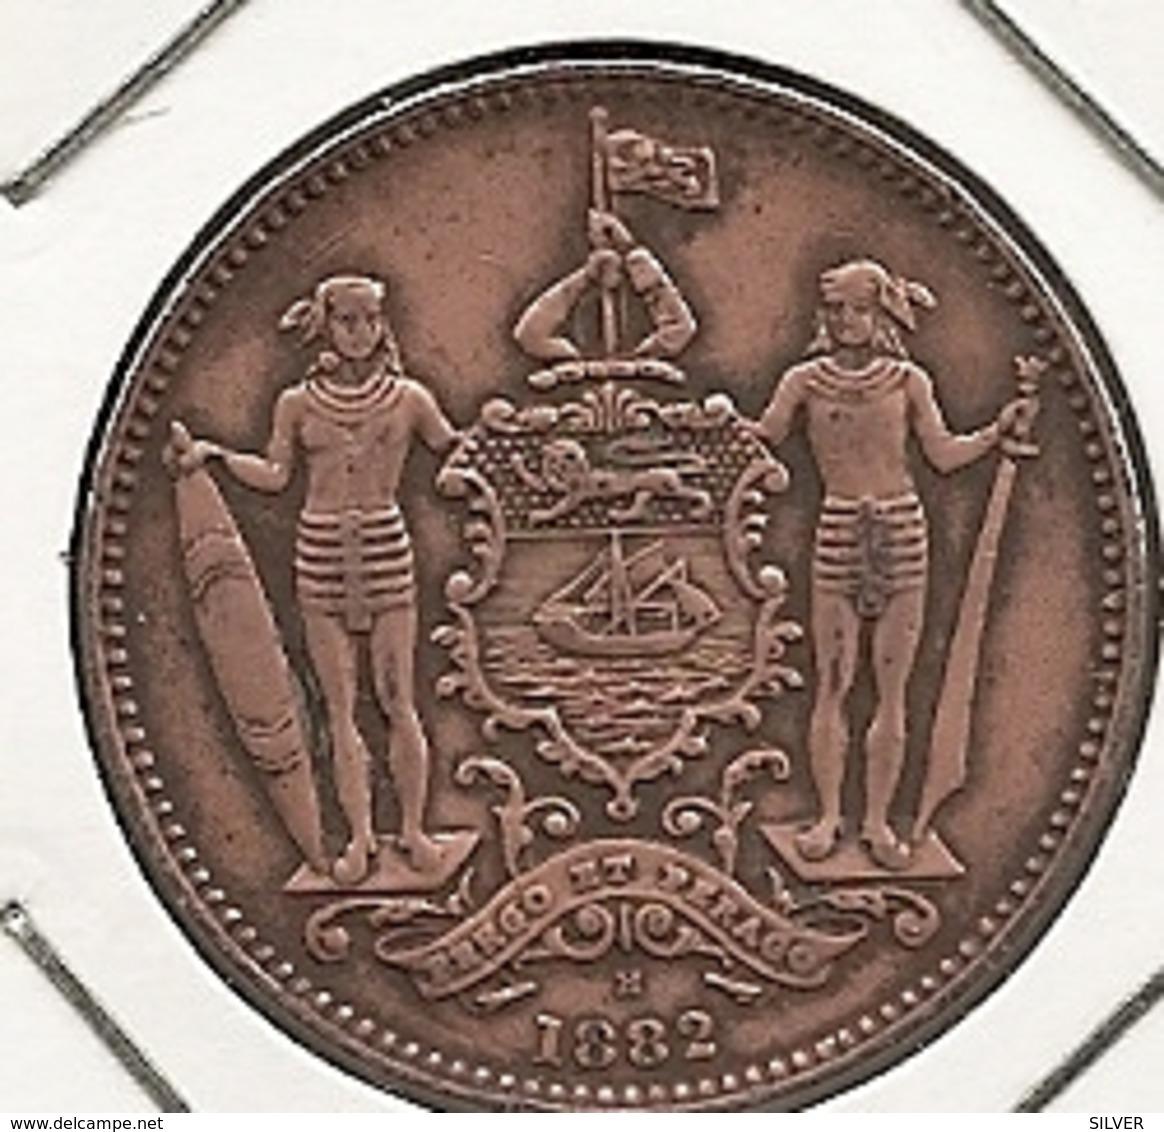 British North Borneo - Malaisie - 1 Cent 1882 H, Birmingham BON ETAT - Malaysie